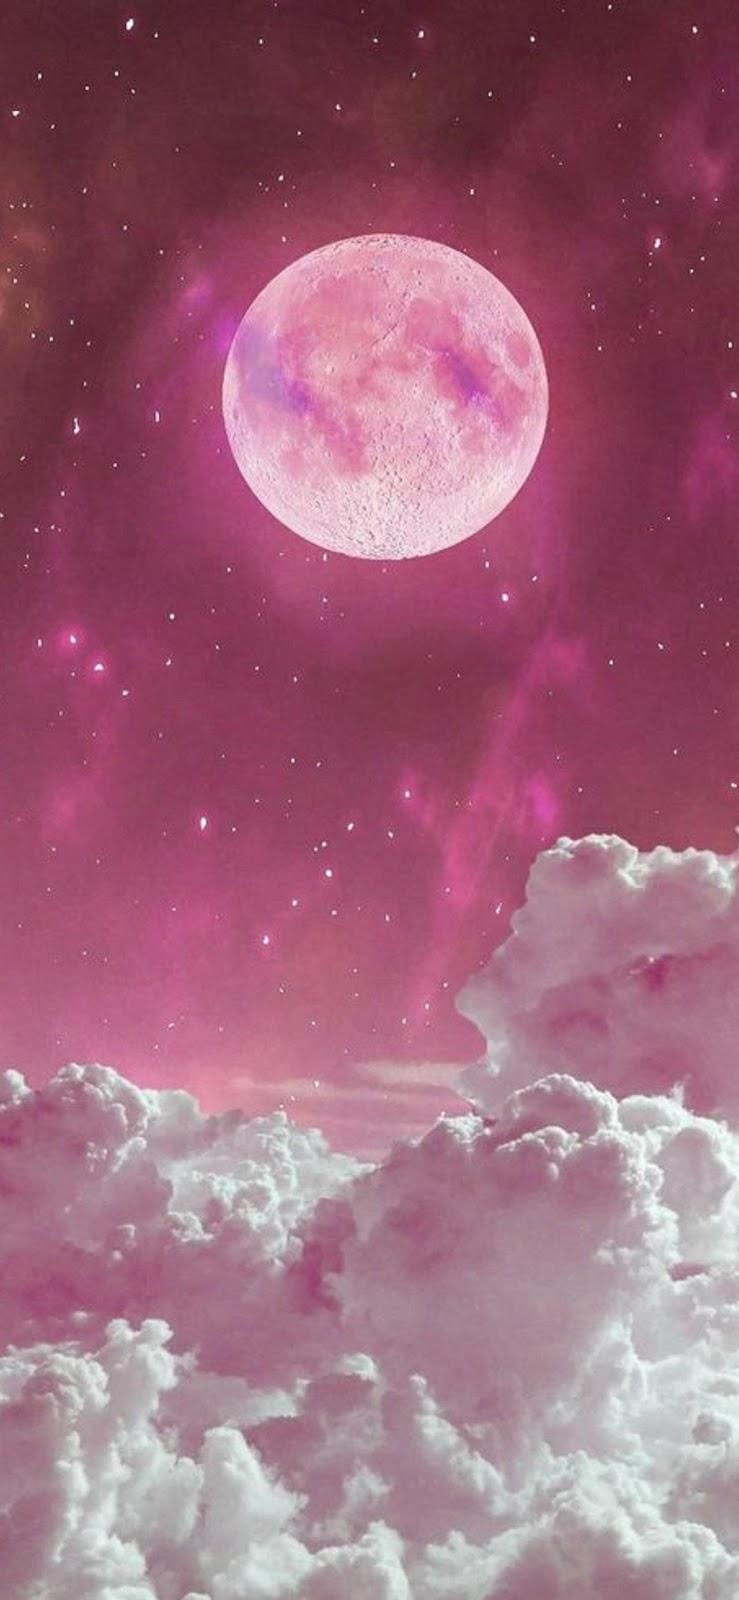 Milky Cloud (iPhone X)